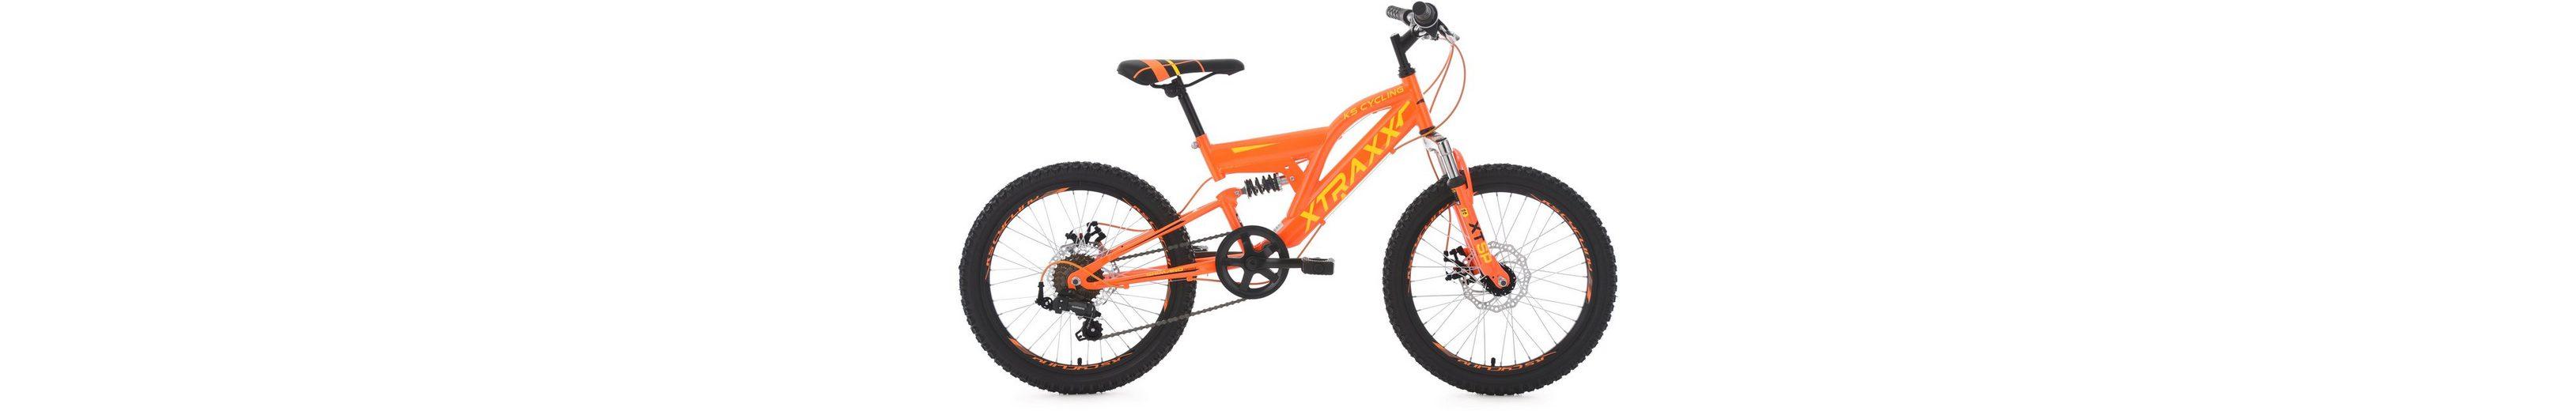 KS Cycling Jugendfahrrad, 20 Zoll, orange-gelb, Shimano 7 Gang-Kettenschaltung, »XTRAXX«